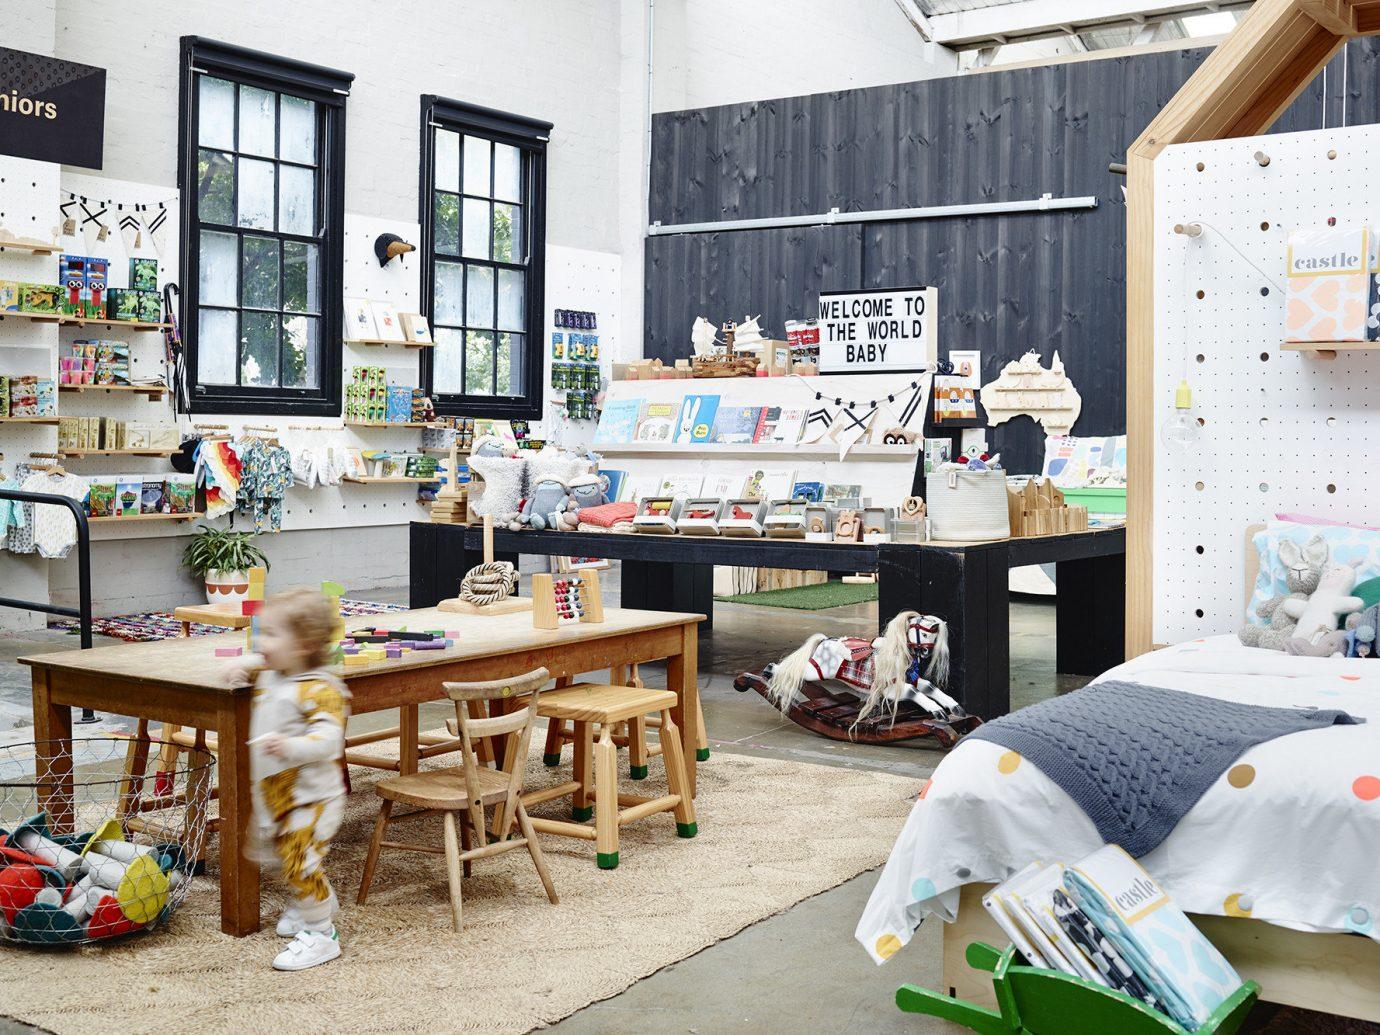 Trip Ideas indoor room home art interior design furniture Design cluttered